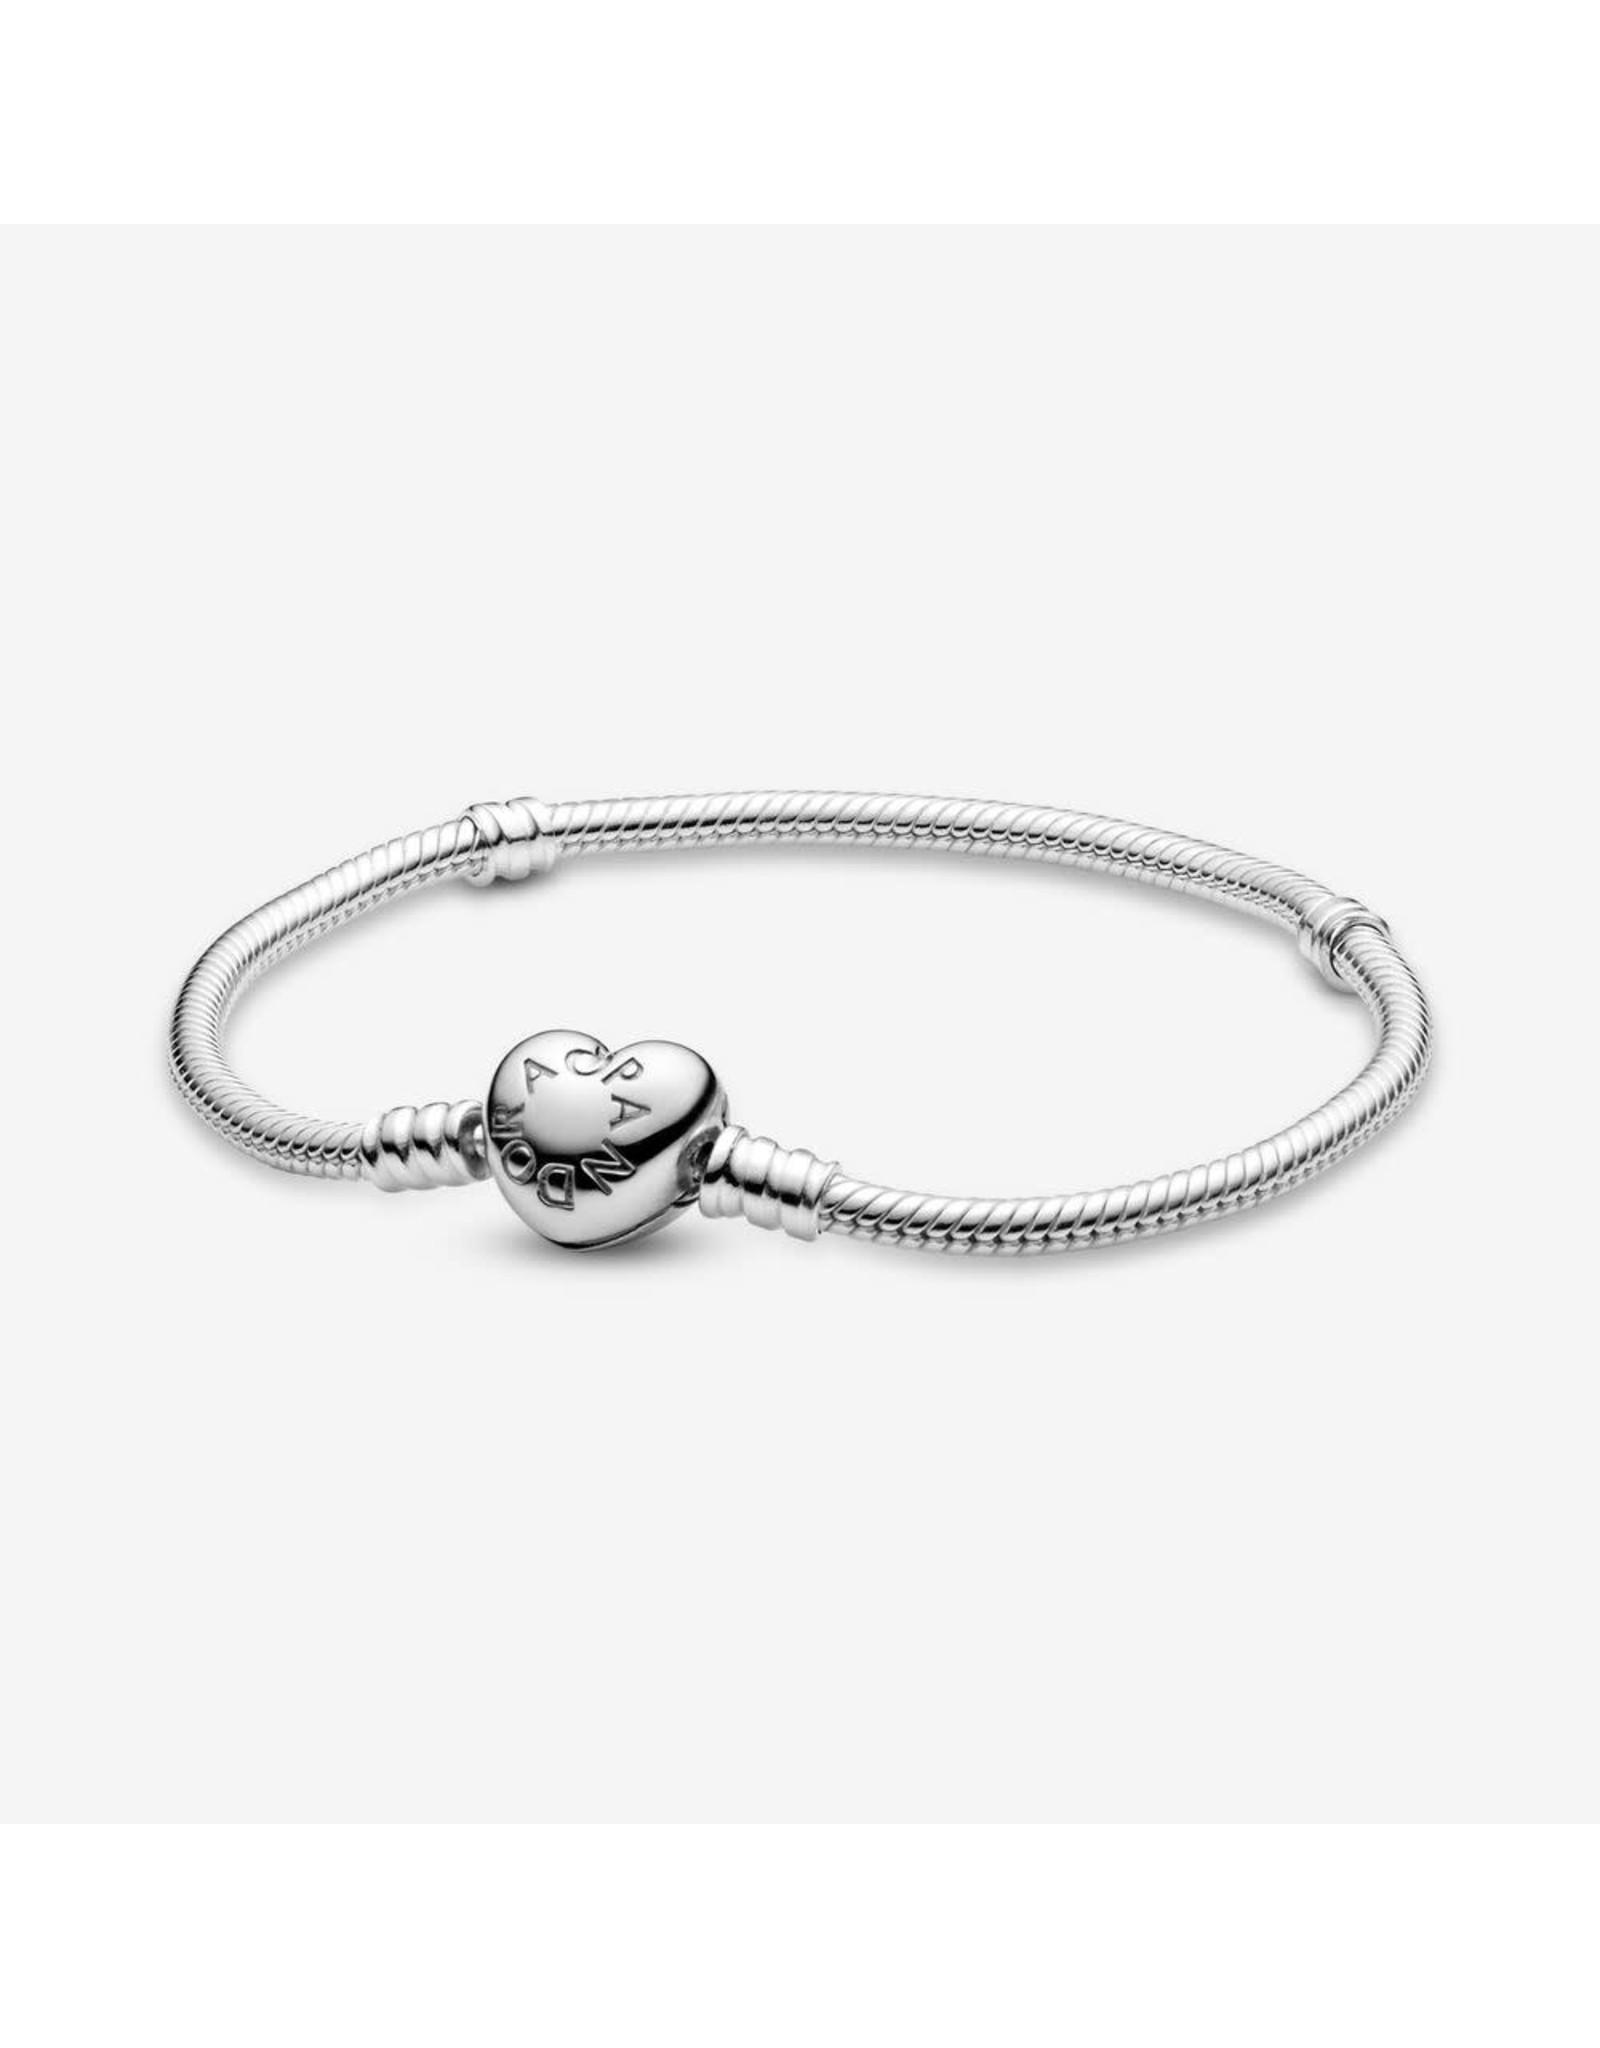 Pandora Pandora Moments,590719 Heart Clasp Snake Chain Bracelet Sterling Silver